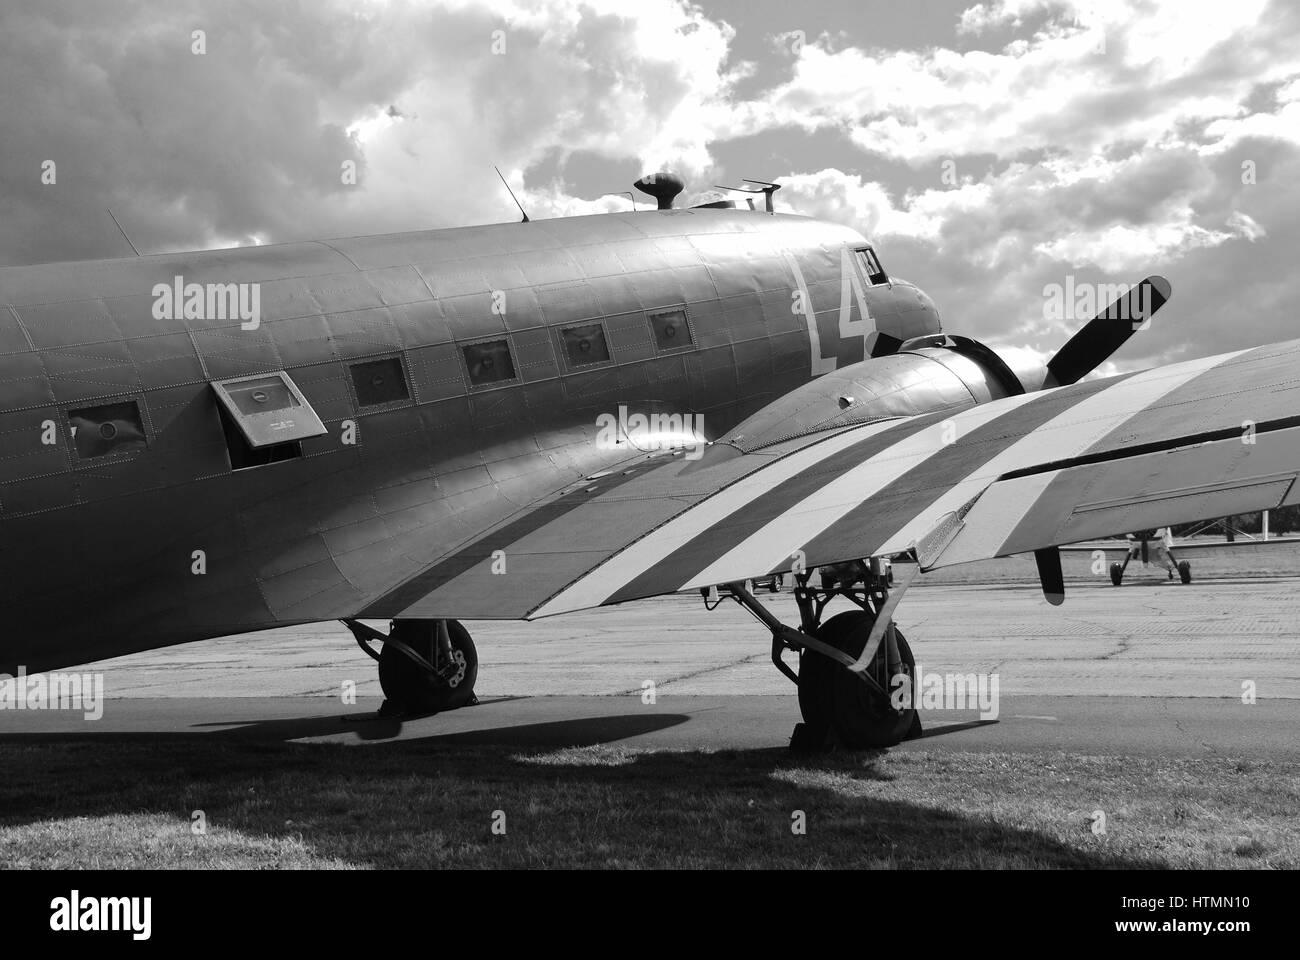 Douglas Dakota C47A military transport plane parked at Dunsfold aerodrome in Surrey, England. The Second World War - Stock Image